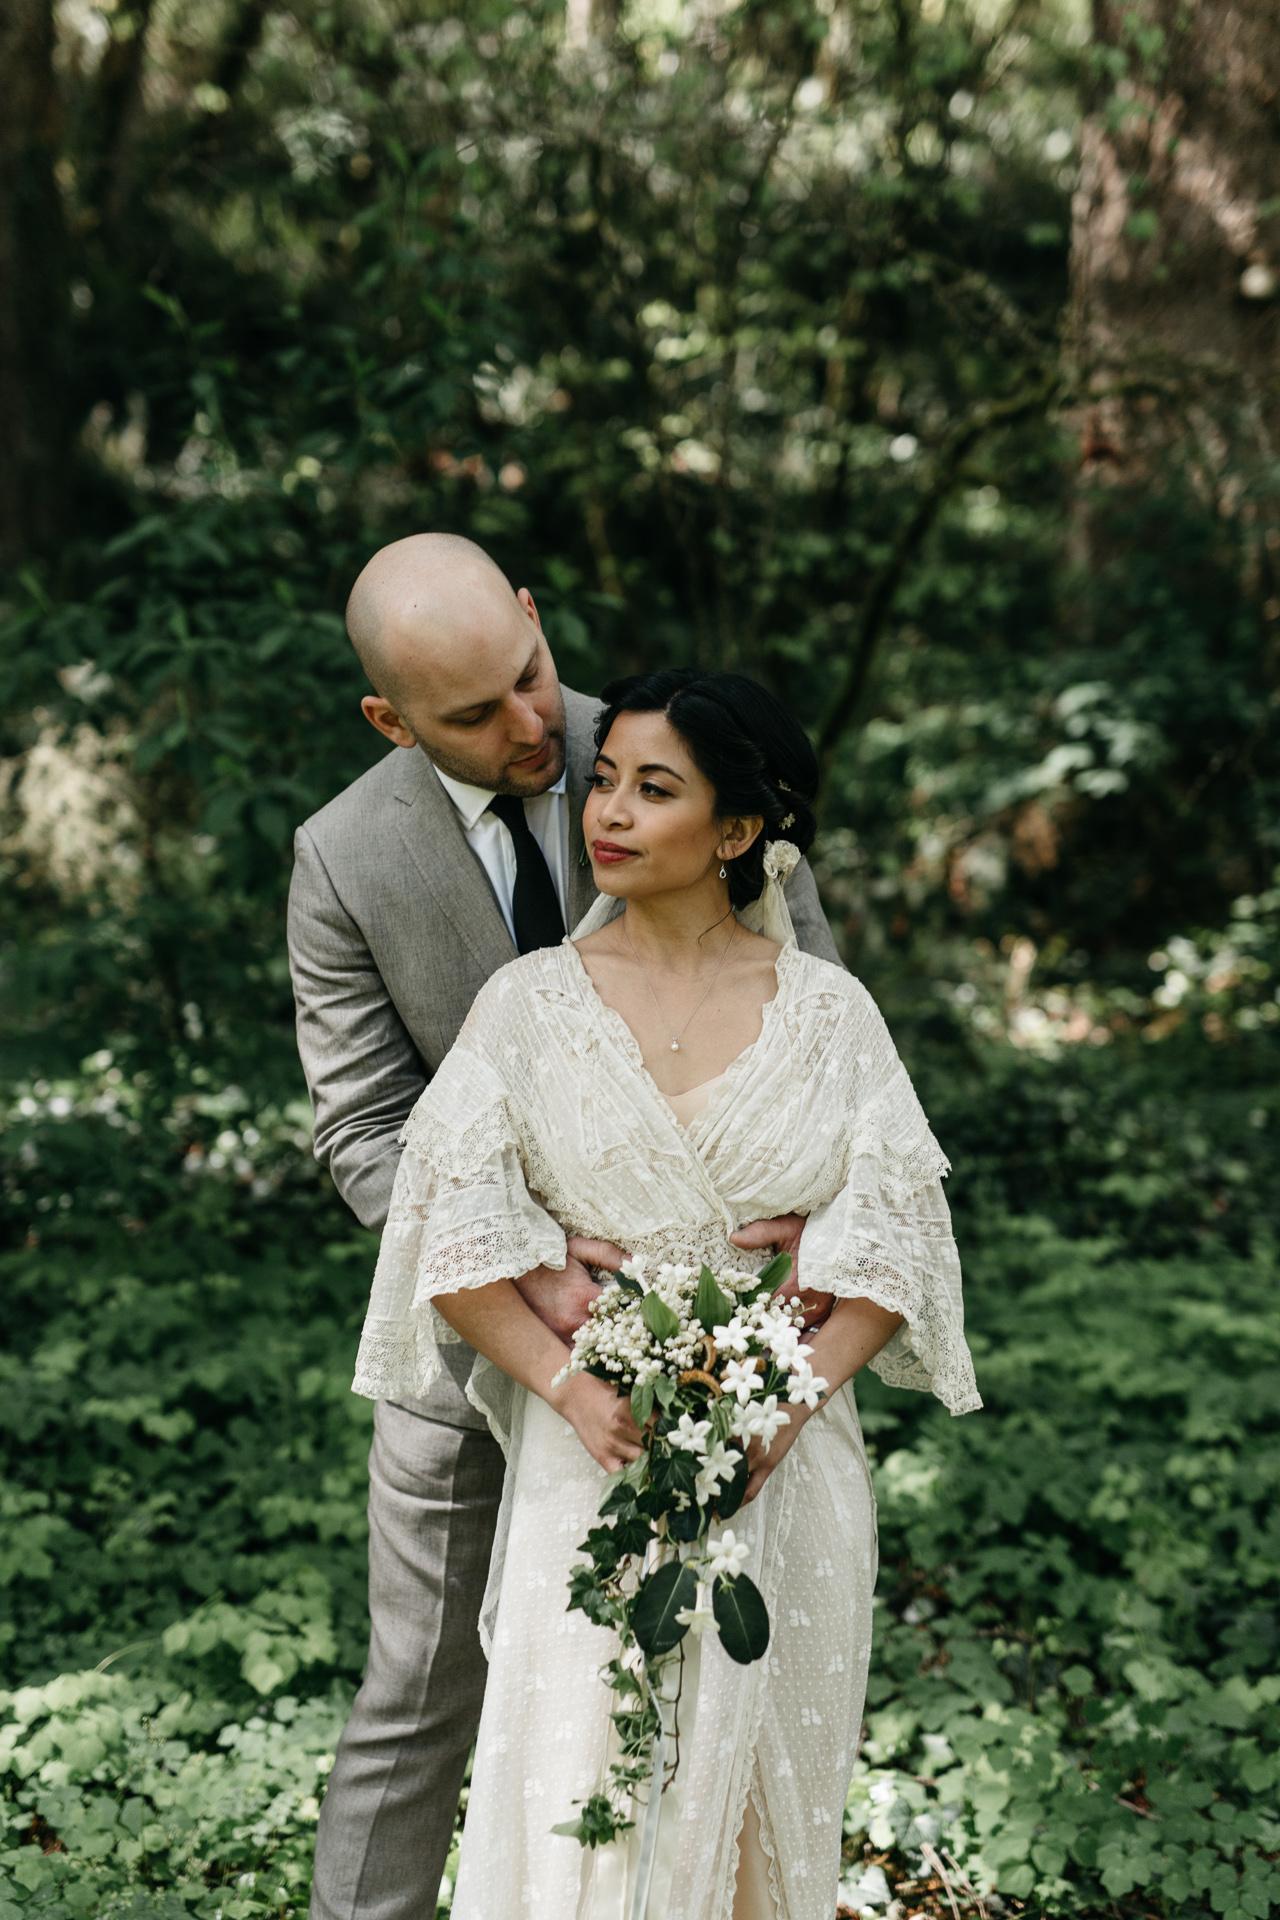 intimate-wedding-portland-oregon-jess-hunter-photography-0857.jpg